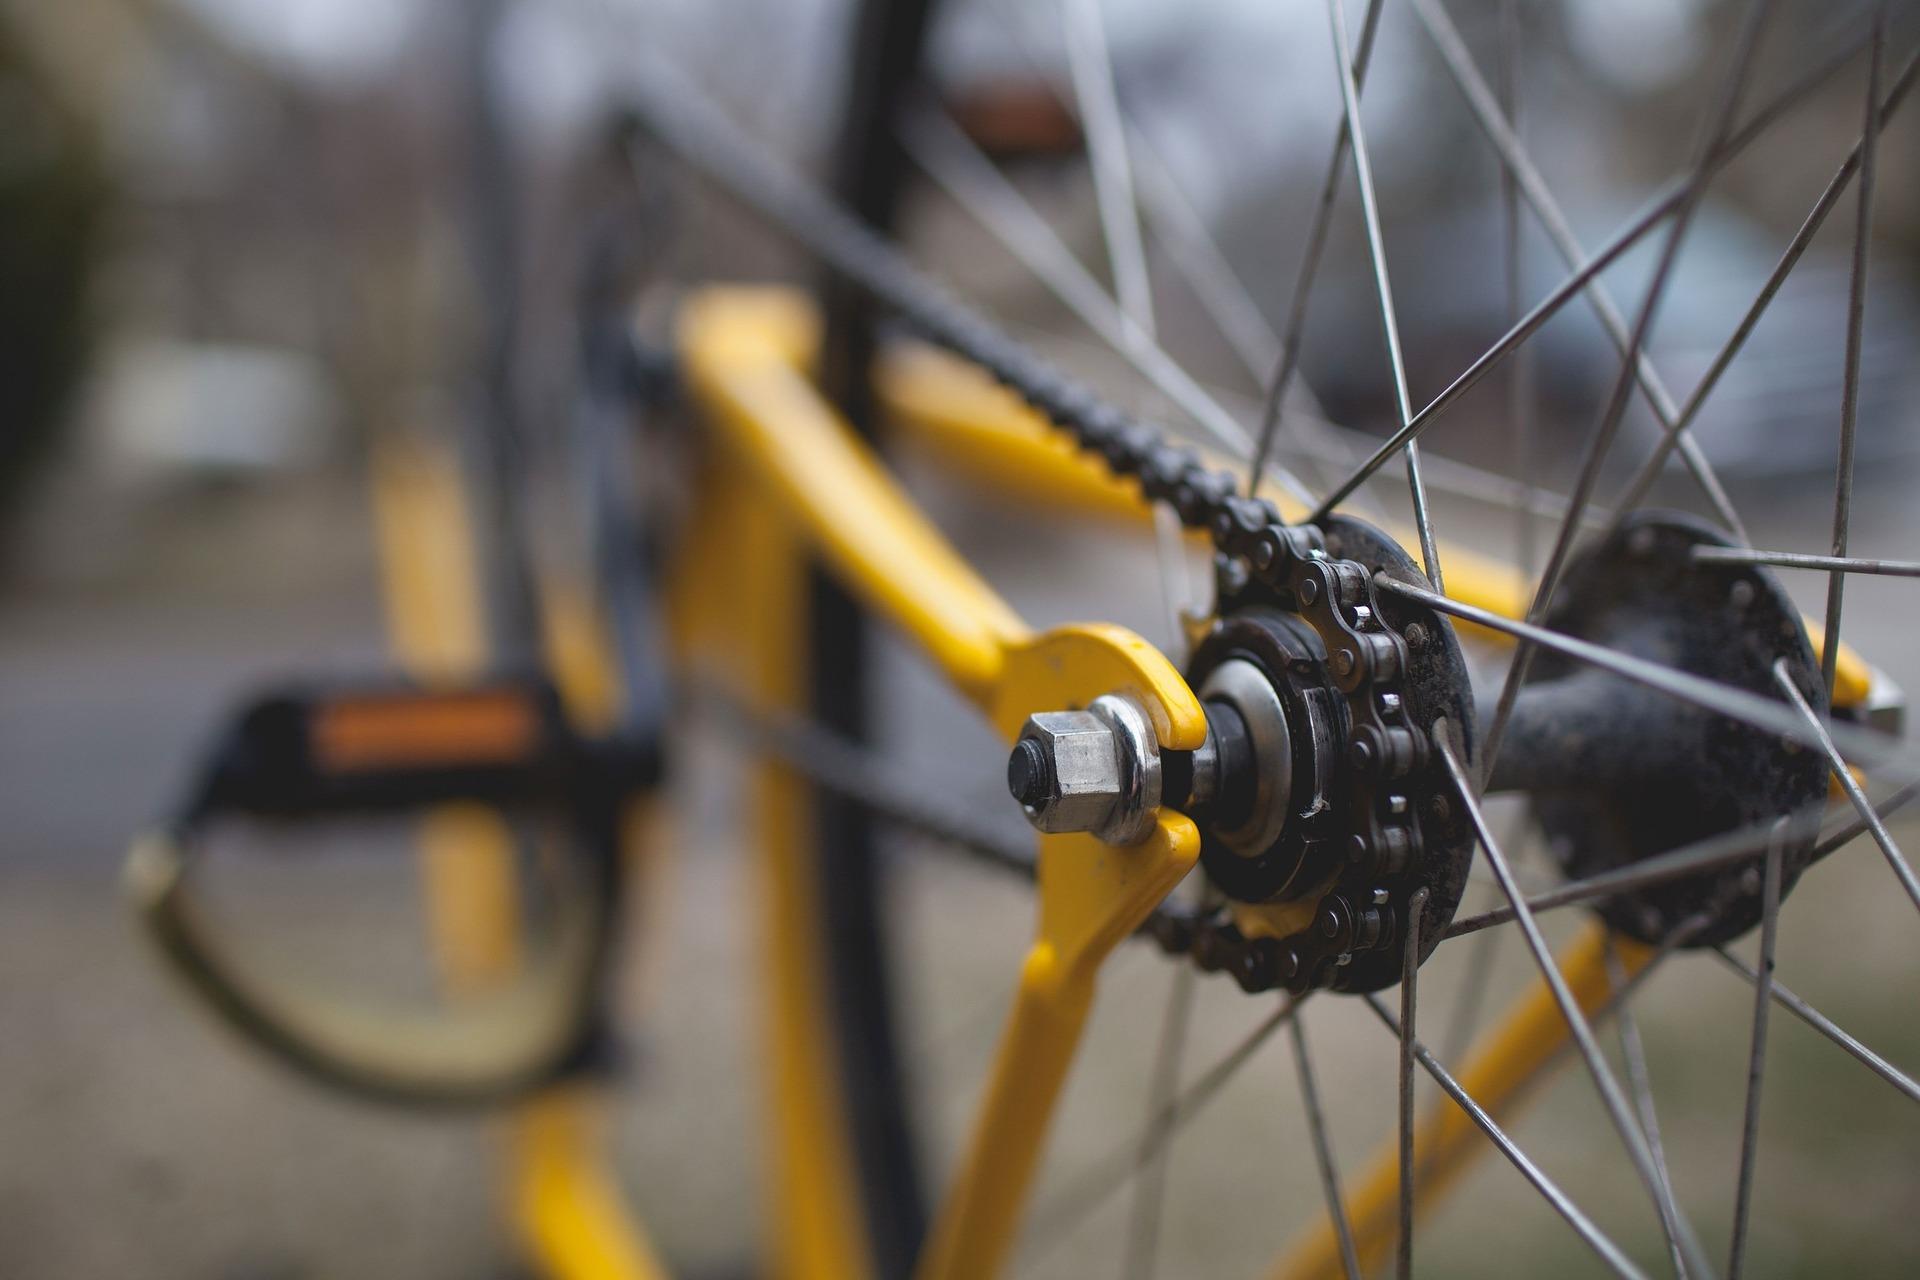 Close up of bike chain